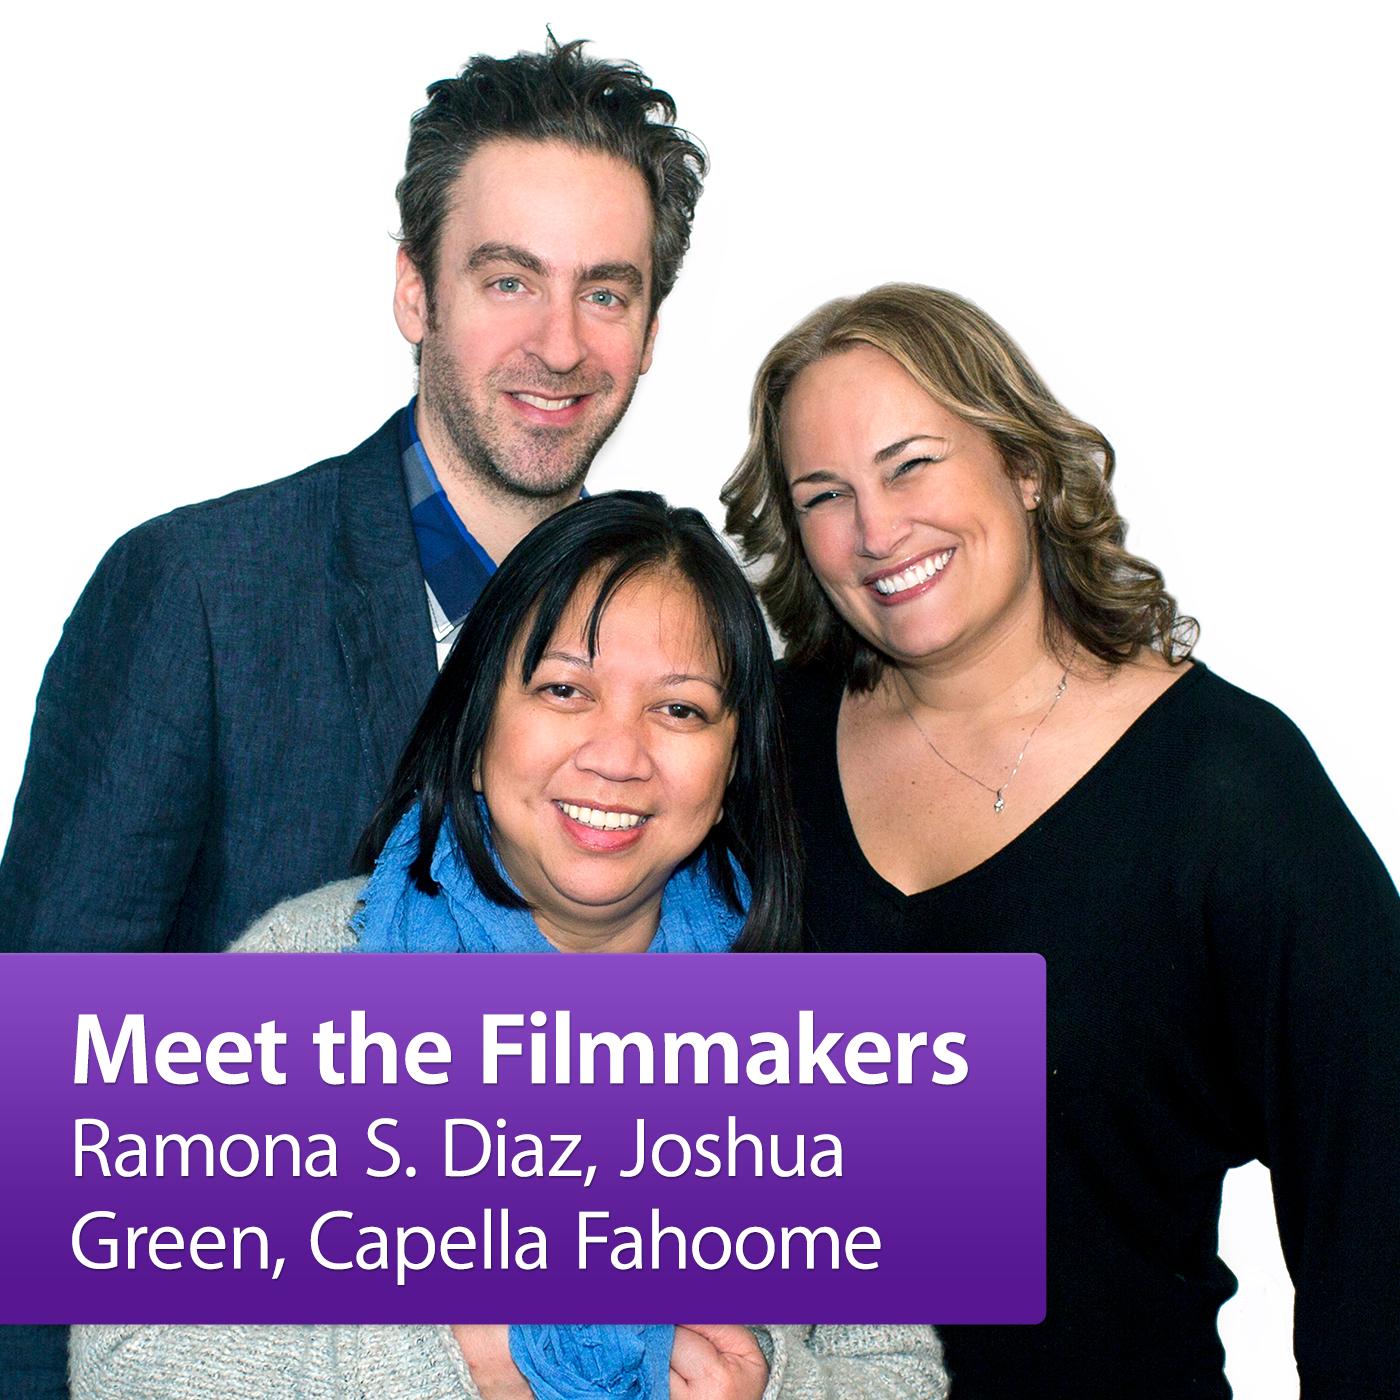 Ramona S. Diaz, Joshua Green, Capella Fahoome: Meet the Filmmakers